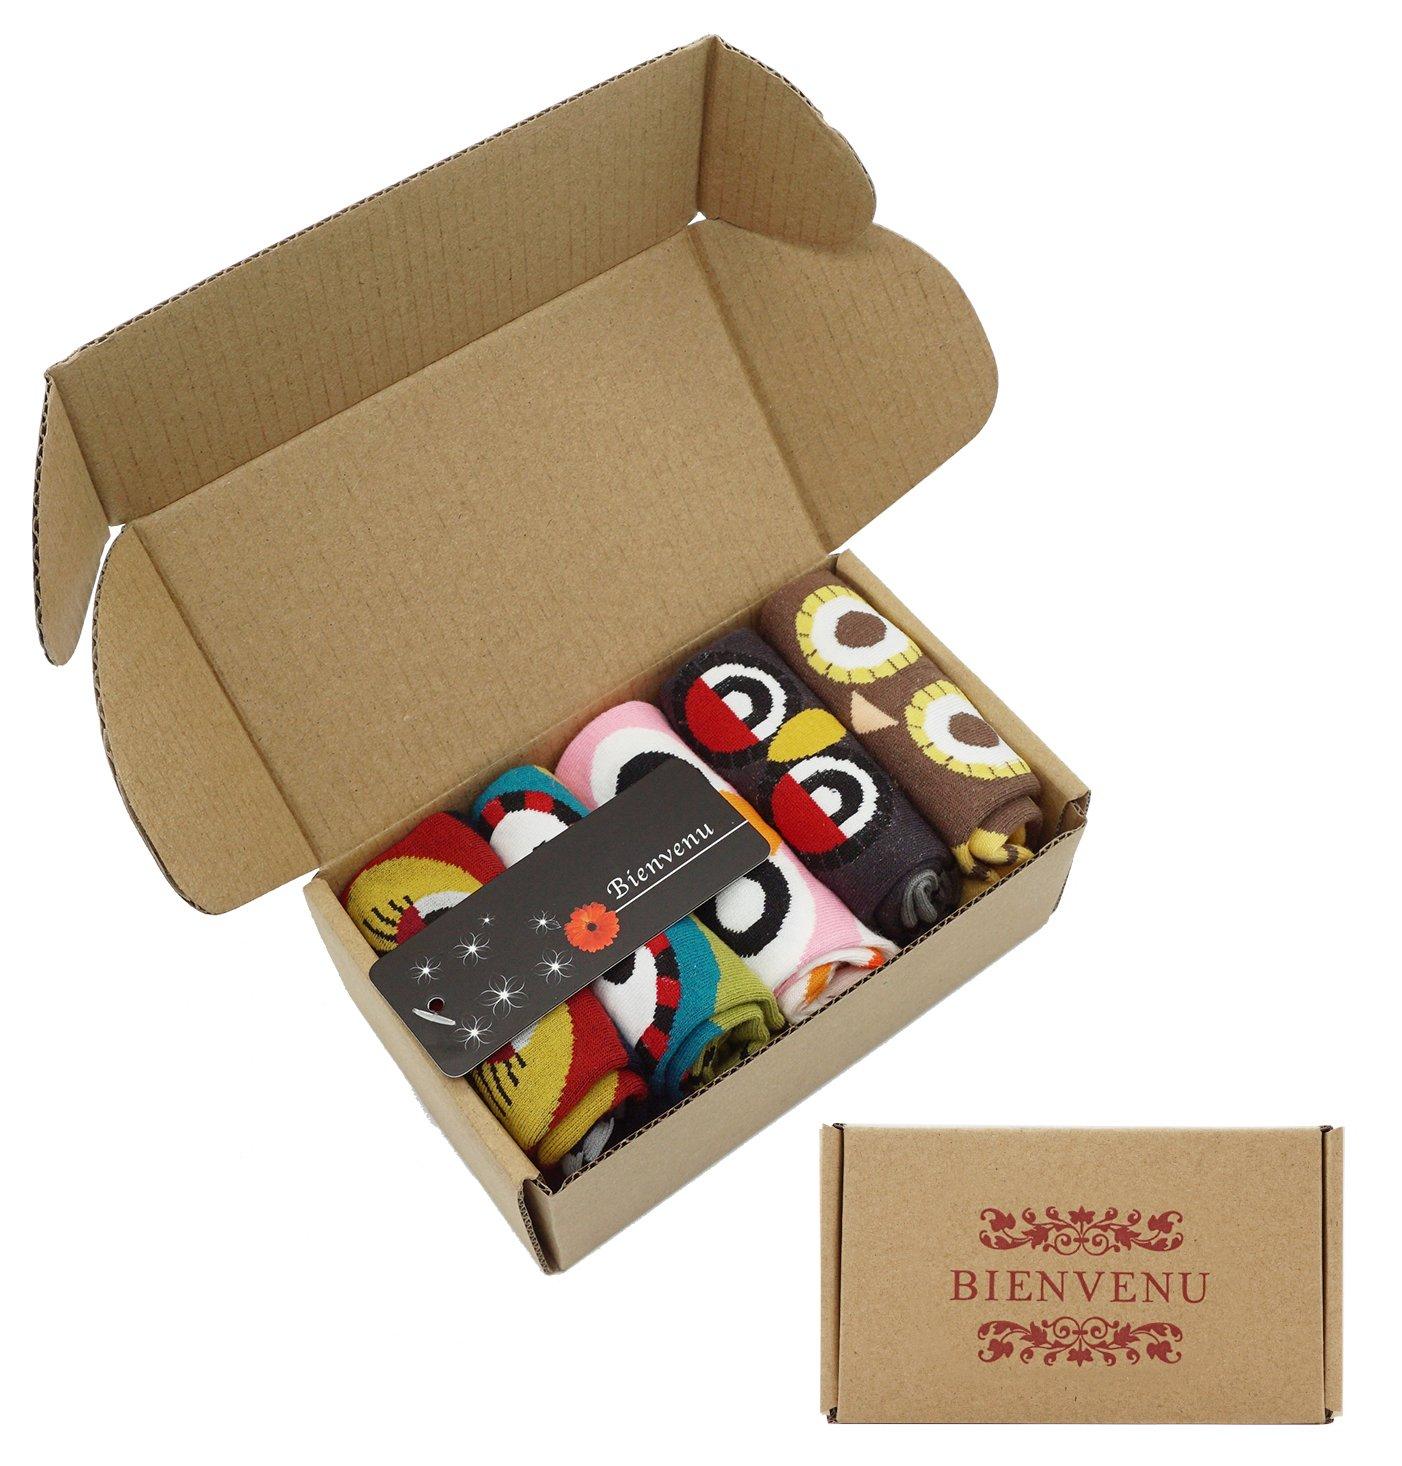 Women's Lady's Cute Owl Design Cotton Socks,5 Pairs Multi Color One Size by Bienvenu (Image #7)